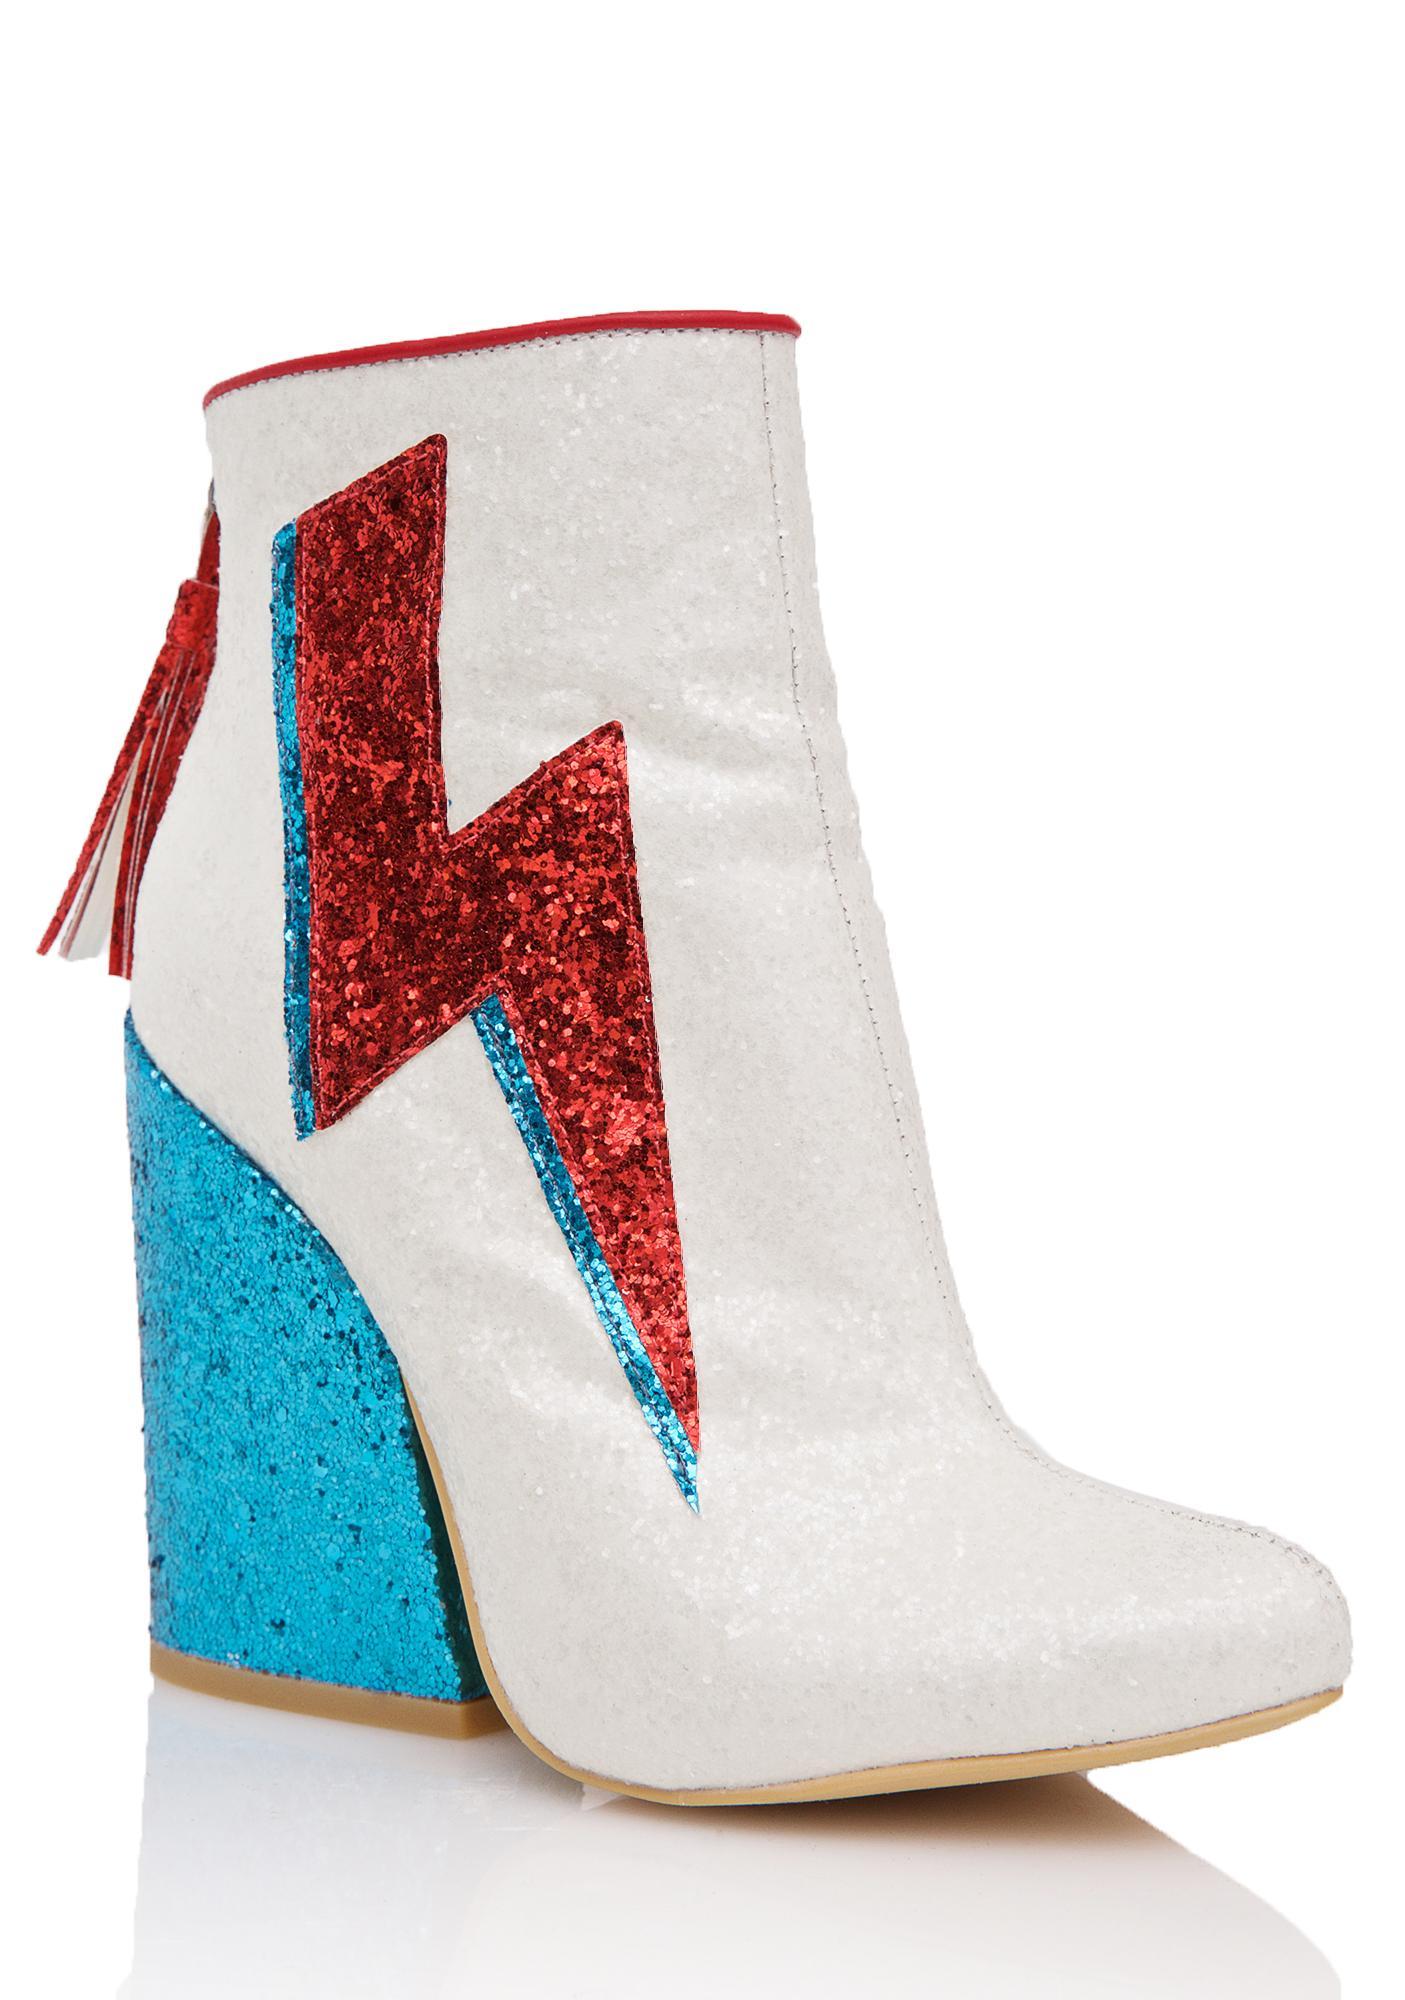 Y.R.U. Ziggy Dust Sparkle Lightning Boots